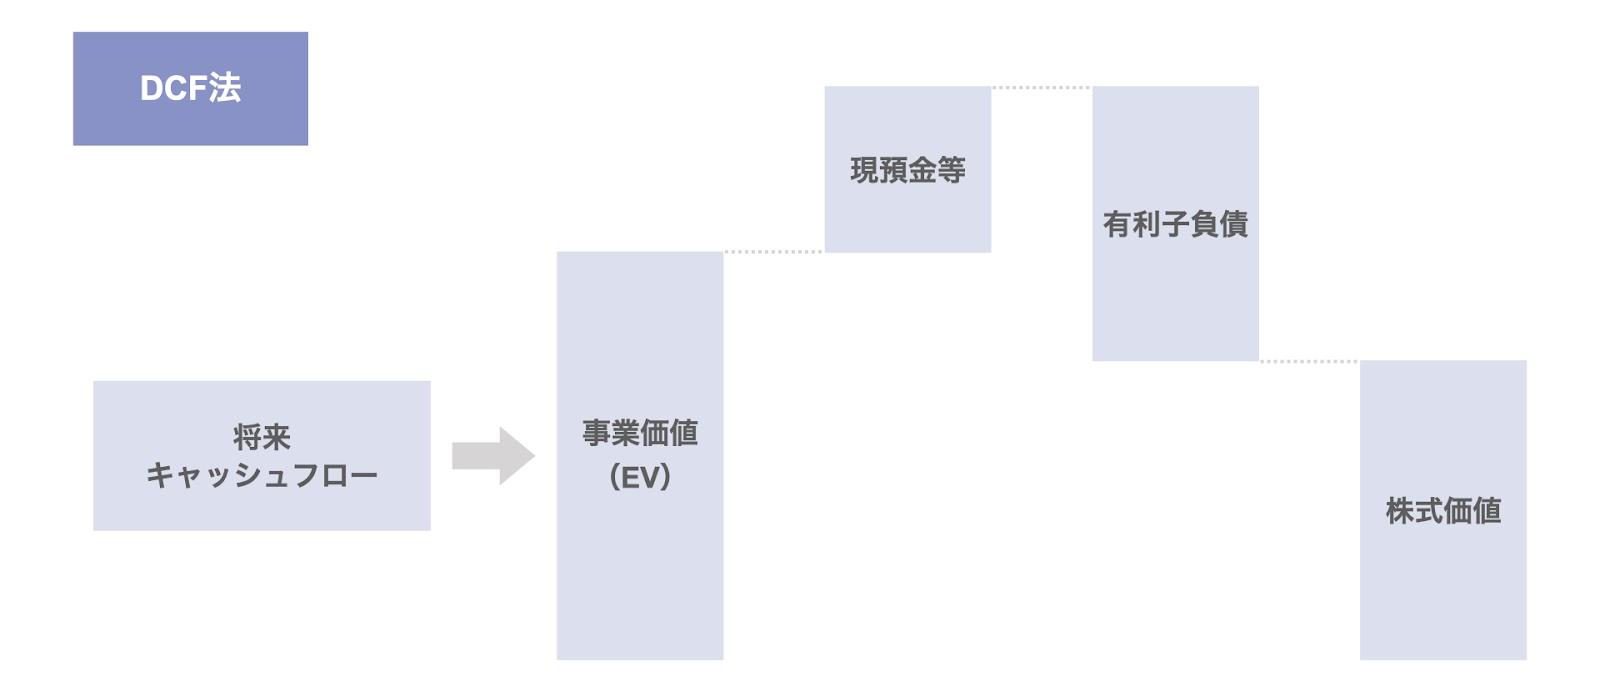 DCF法(割引現在価値法)